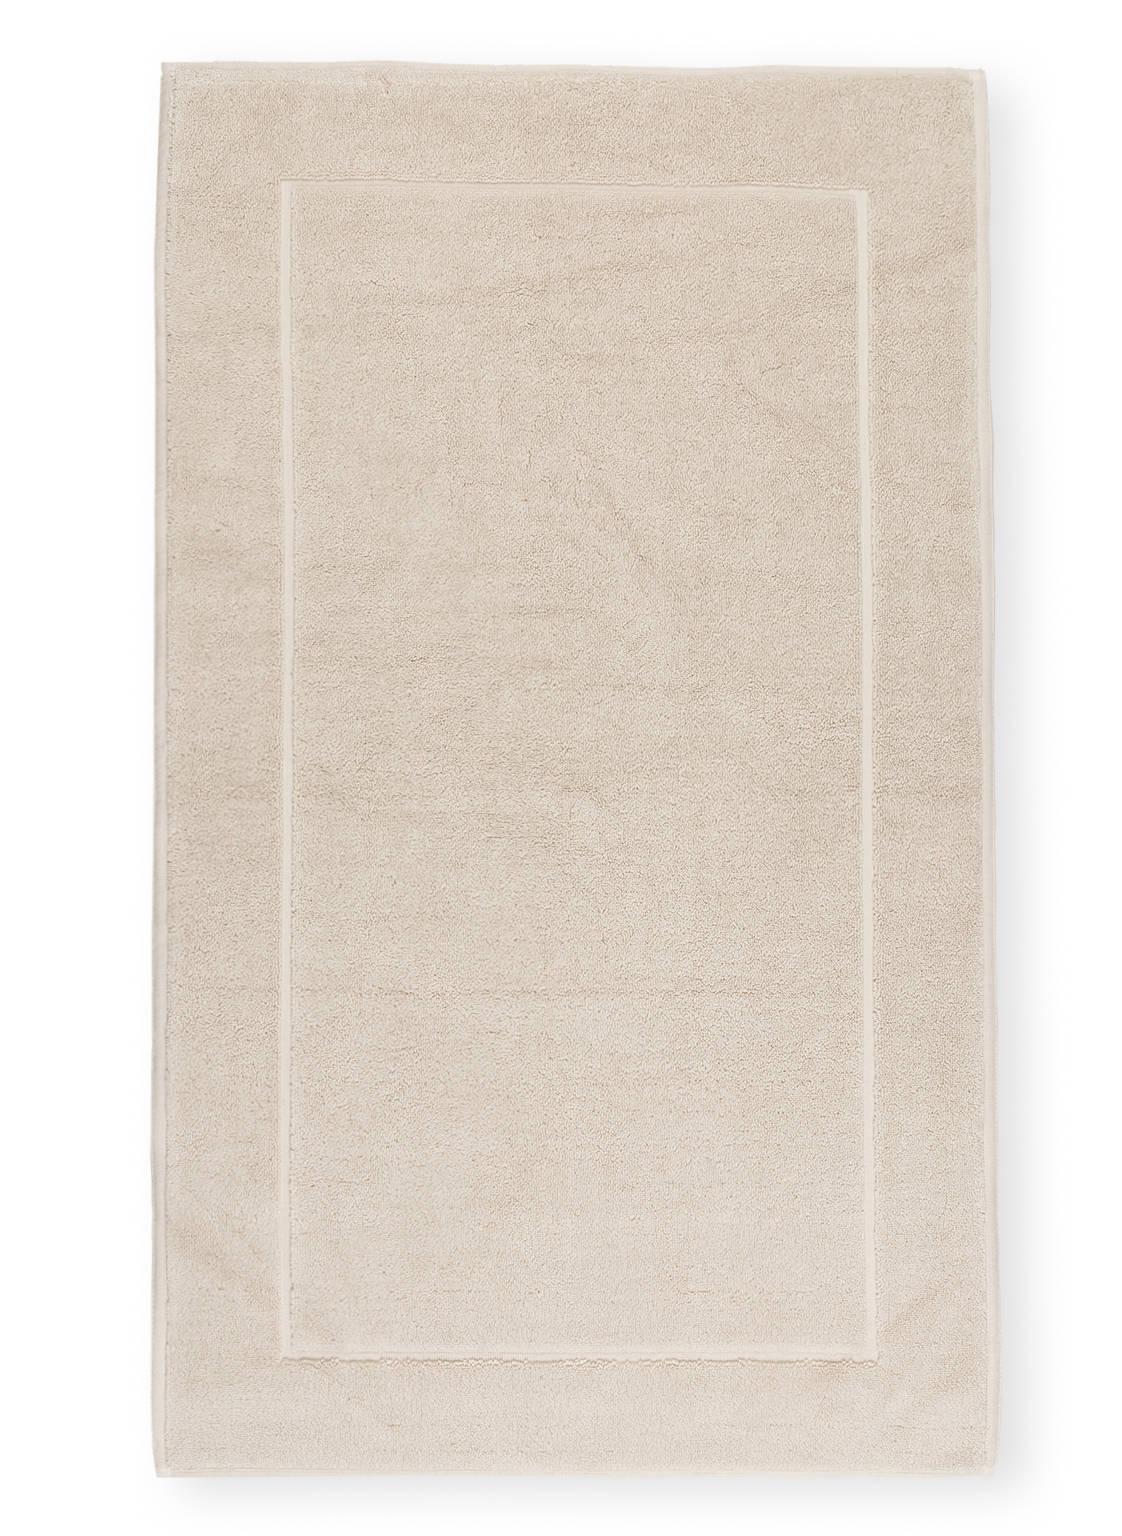 Image of Aquanova Badematte London beige